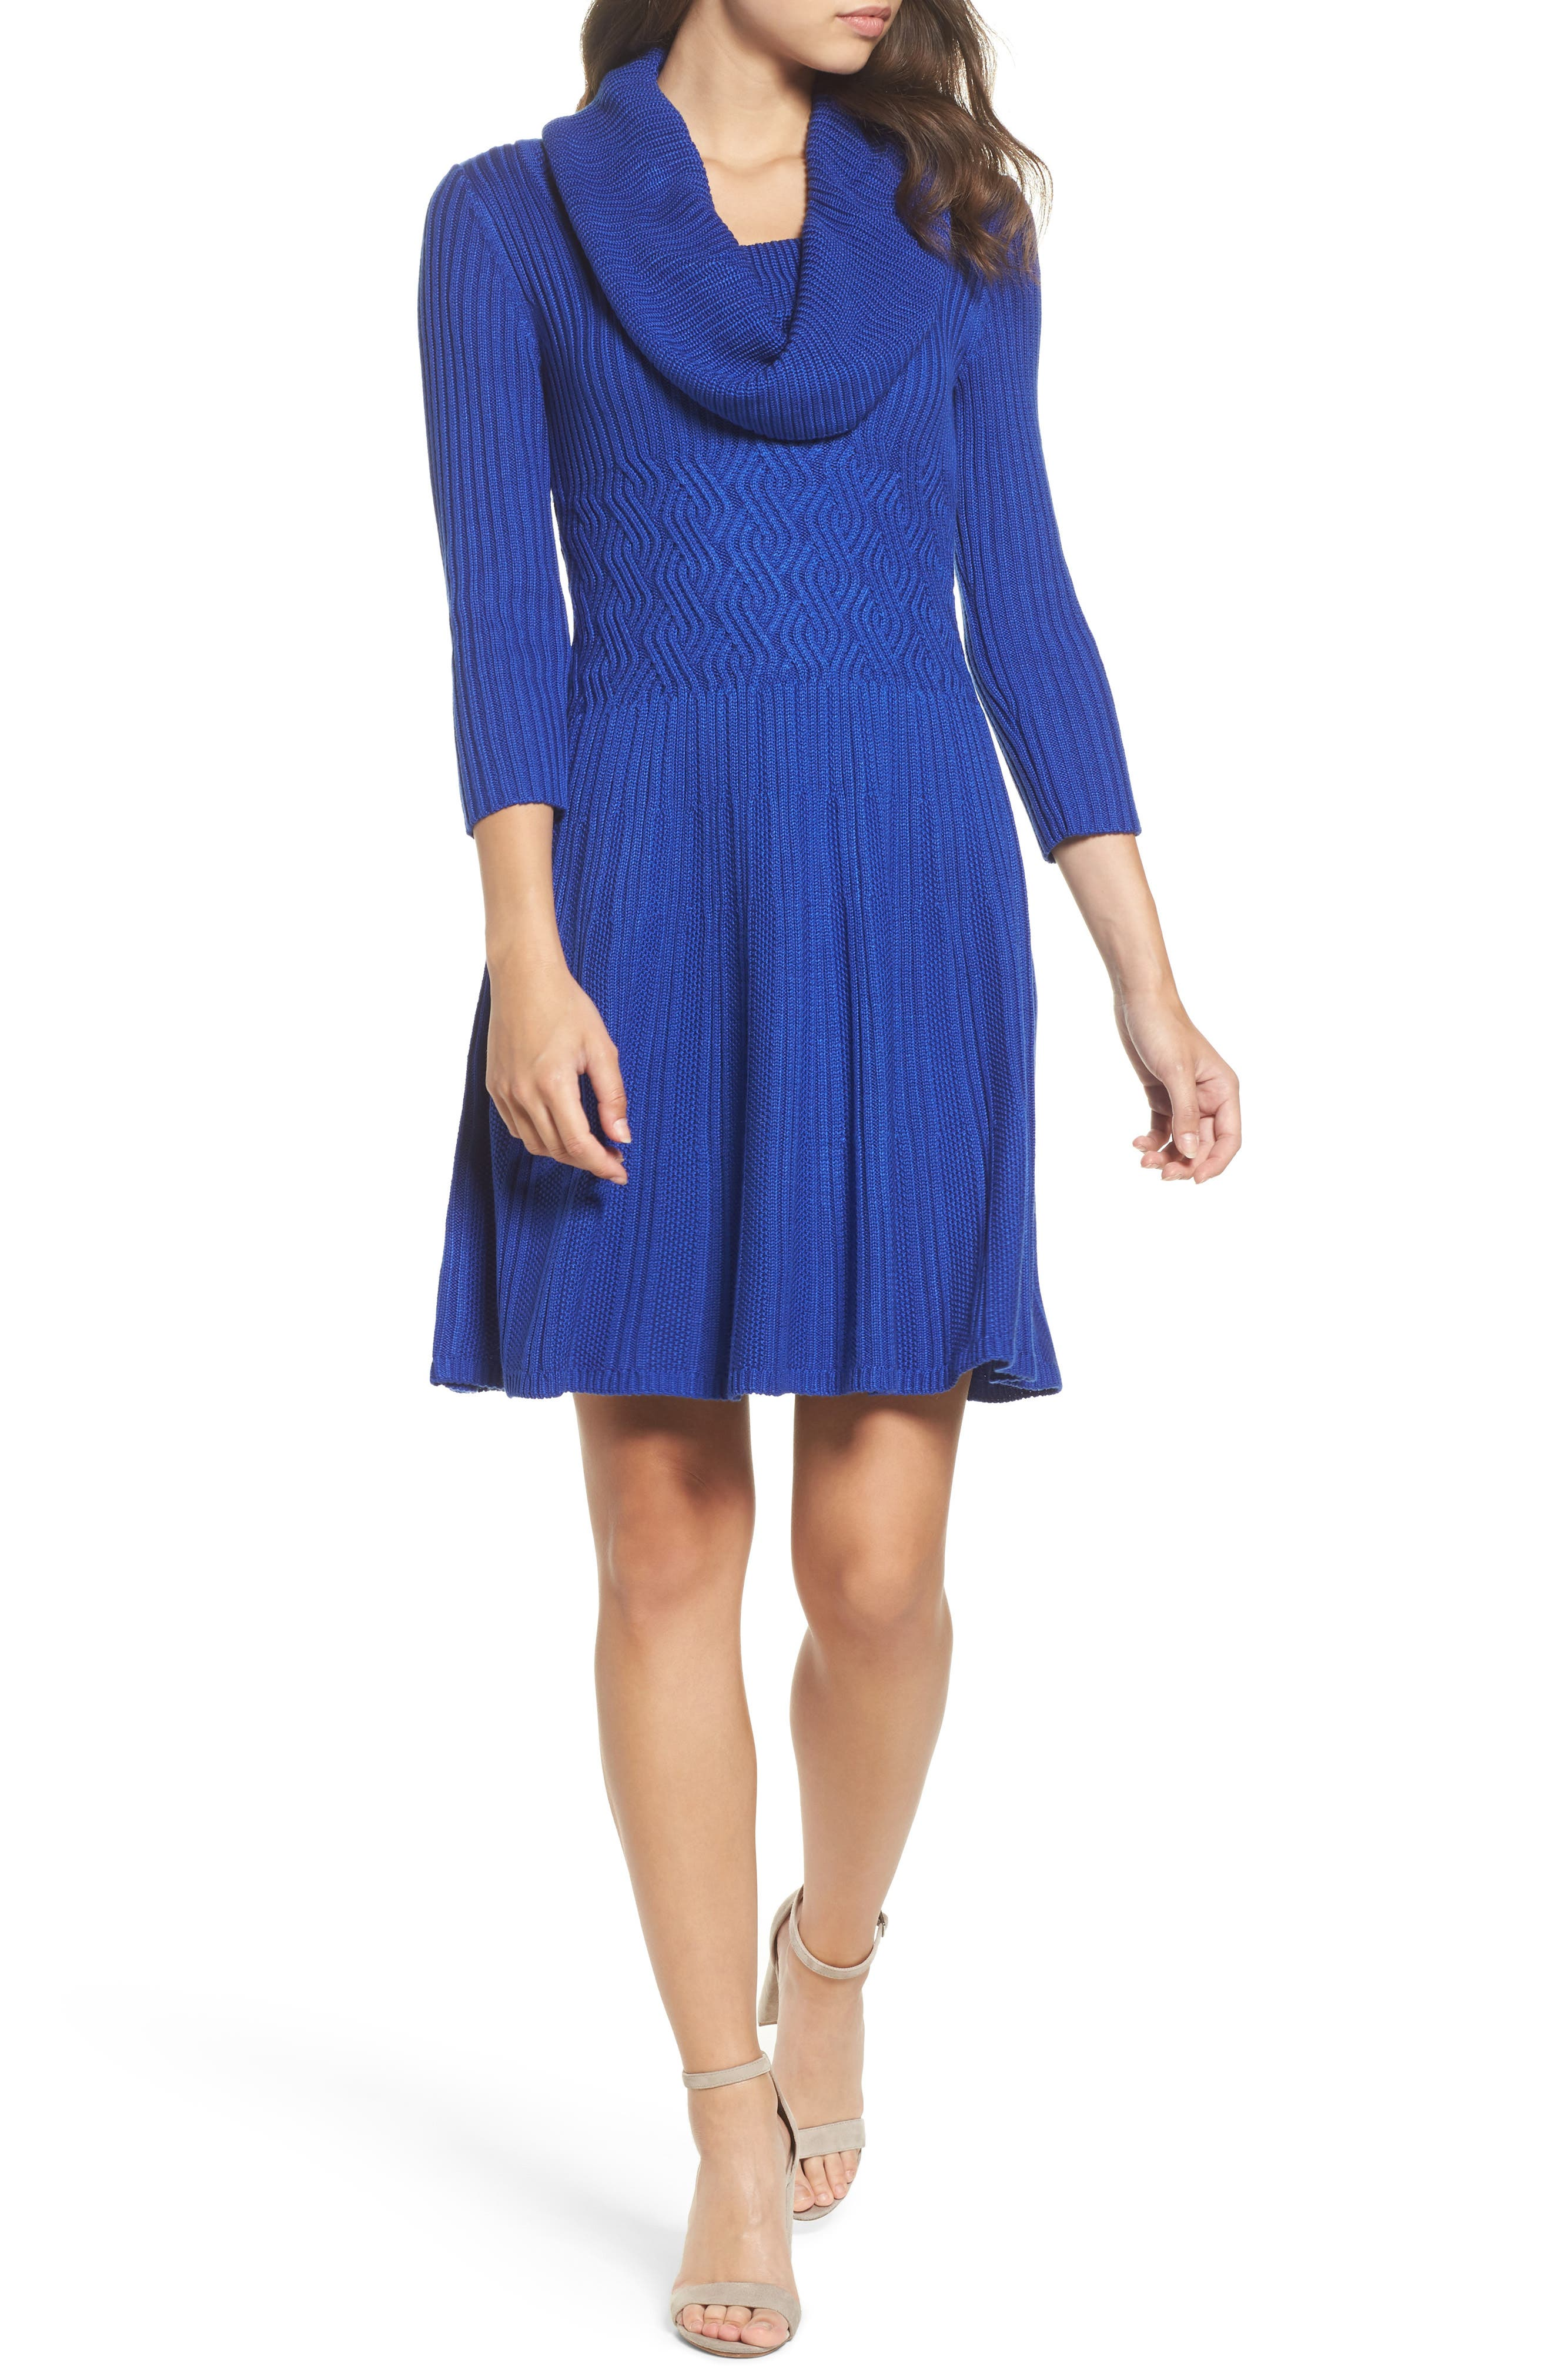 Alternate Image 1 Selected - Eliza J Cowl Neck Sweater Dress